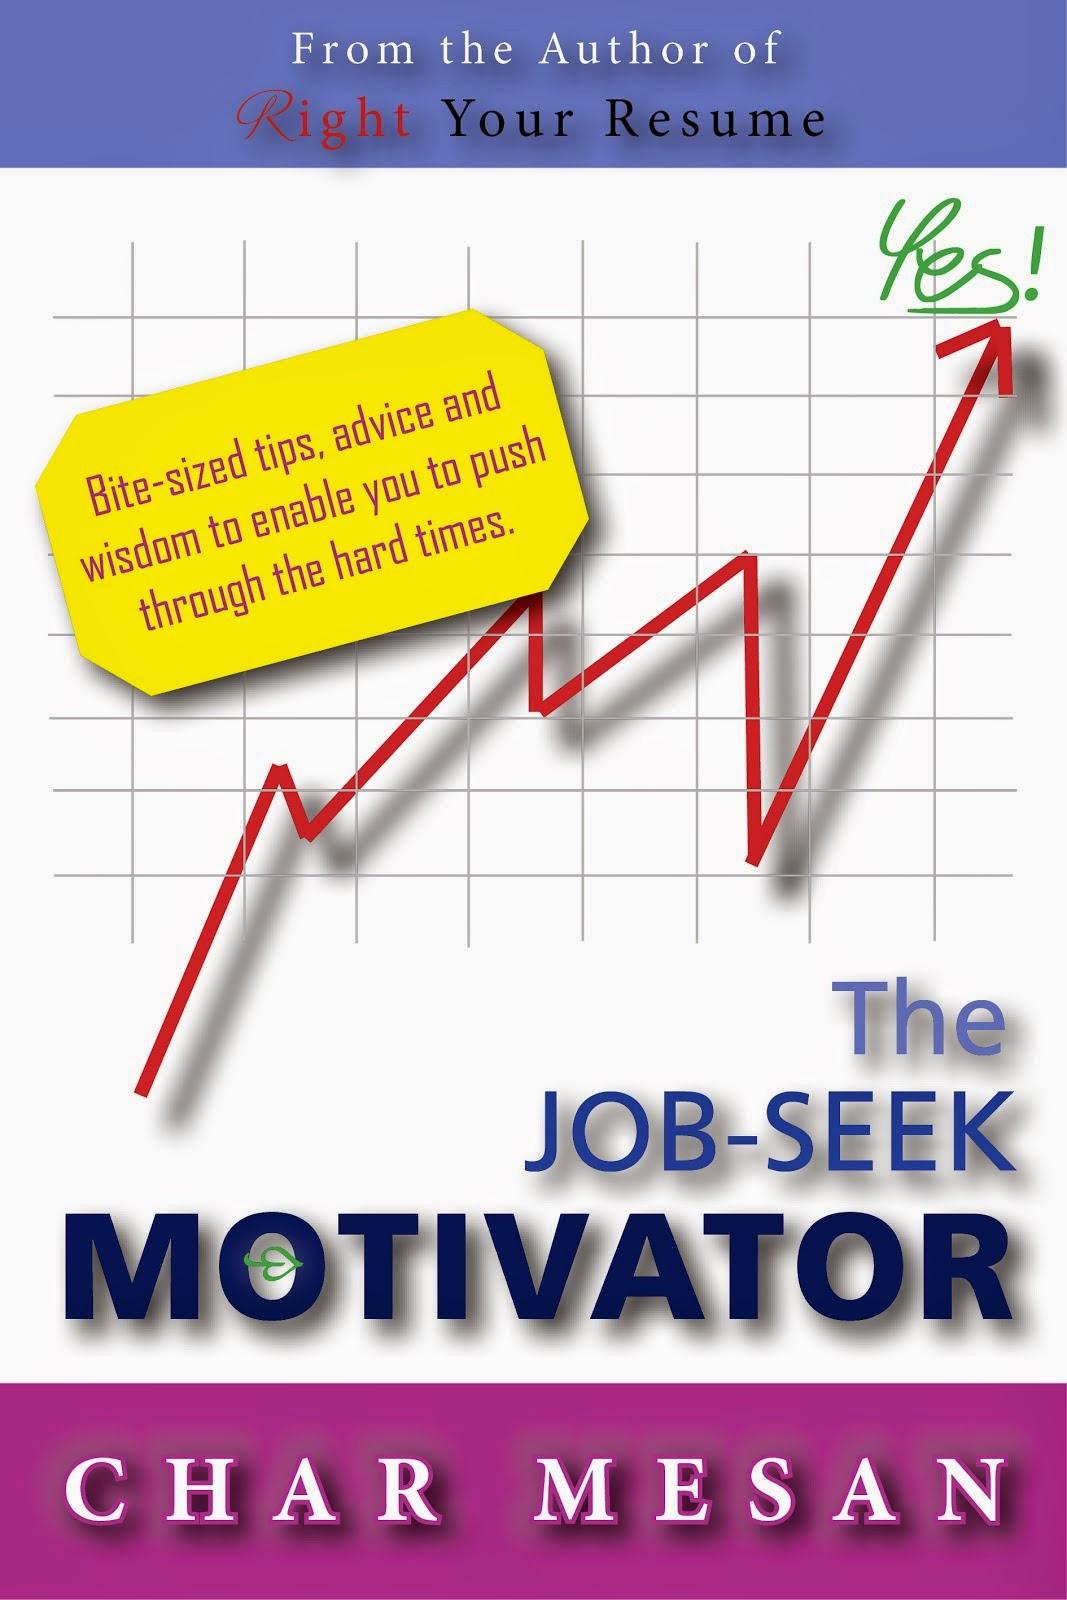 Char Mesan Job Search Training Free Job Search Action Plan Worksheet